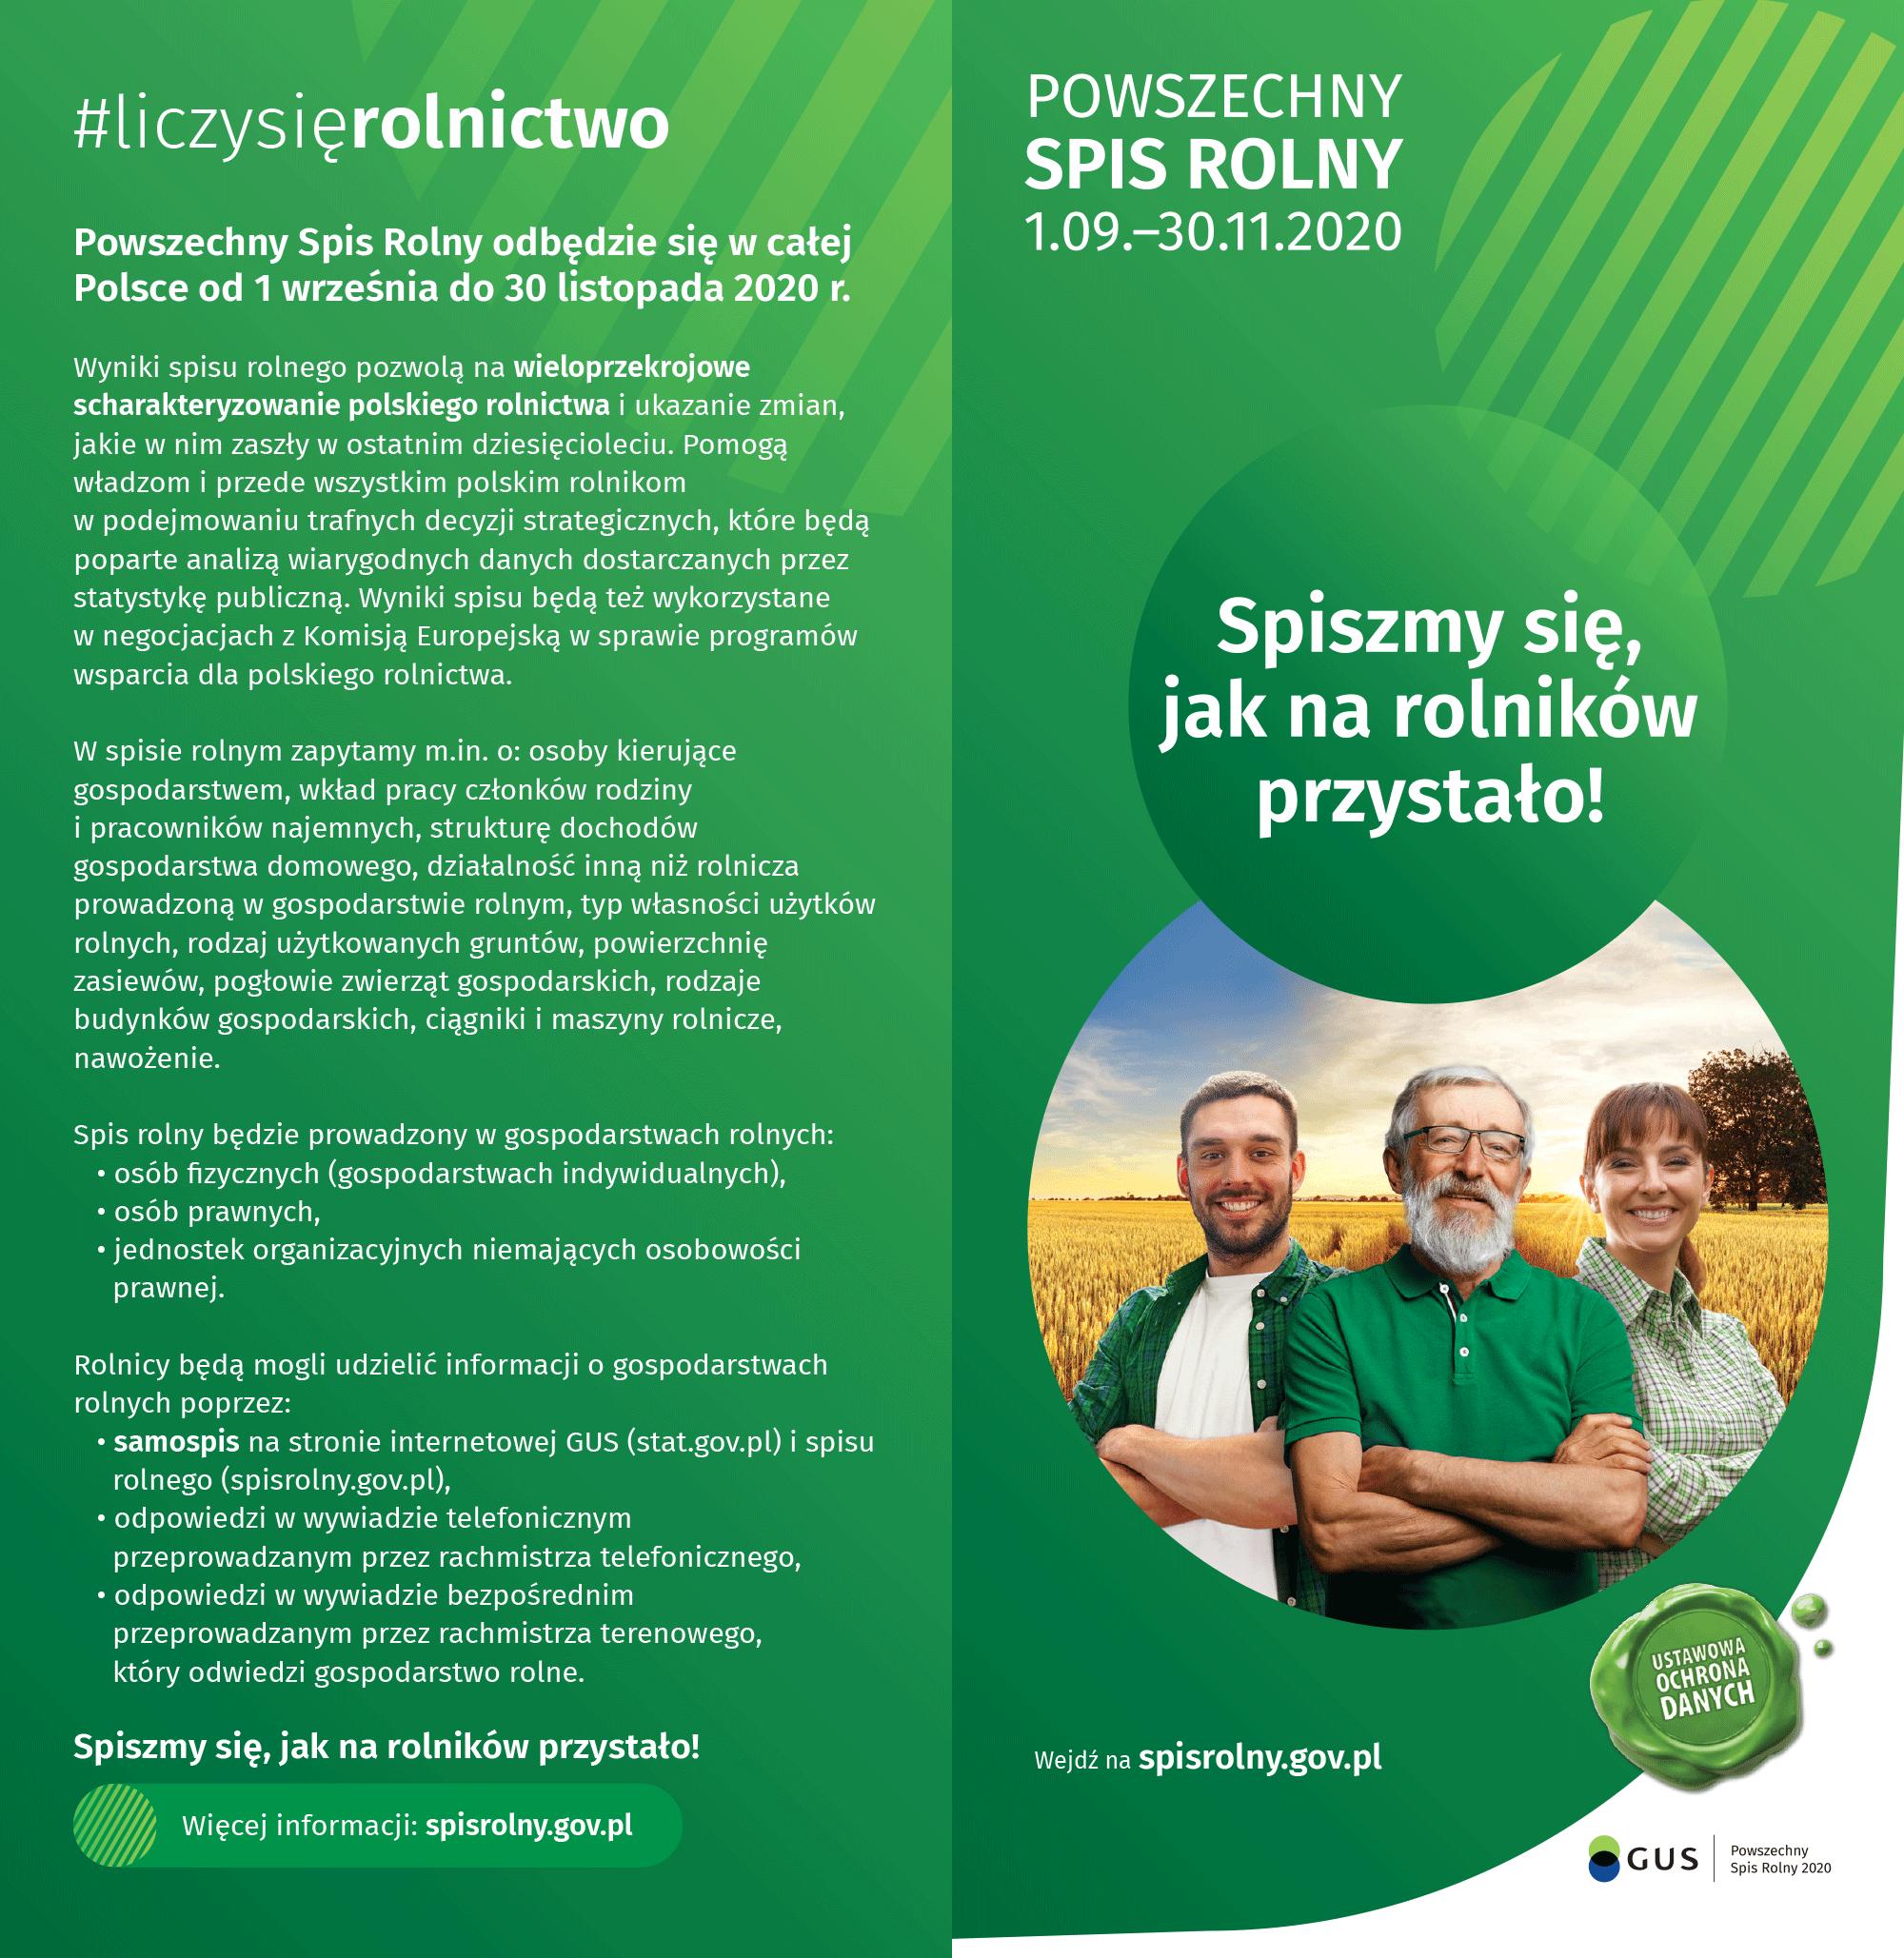 Ulotka Powszechny Spis Rolny 2020r.